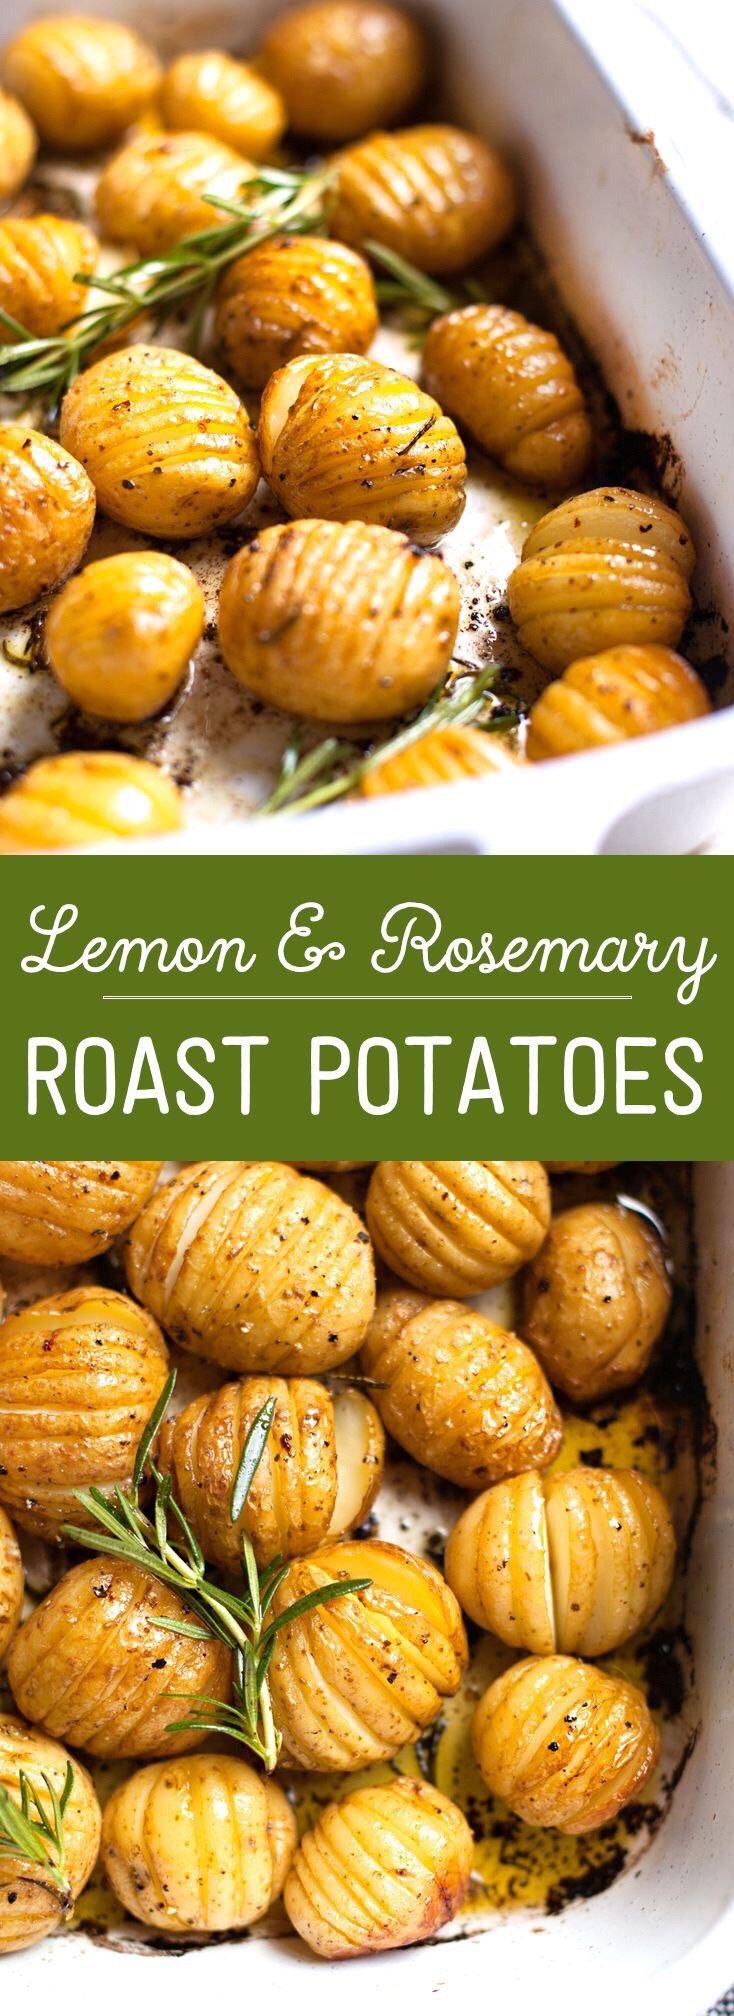 Lemon and Rosemary Roast Potatoes